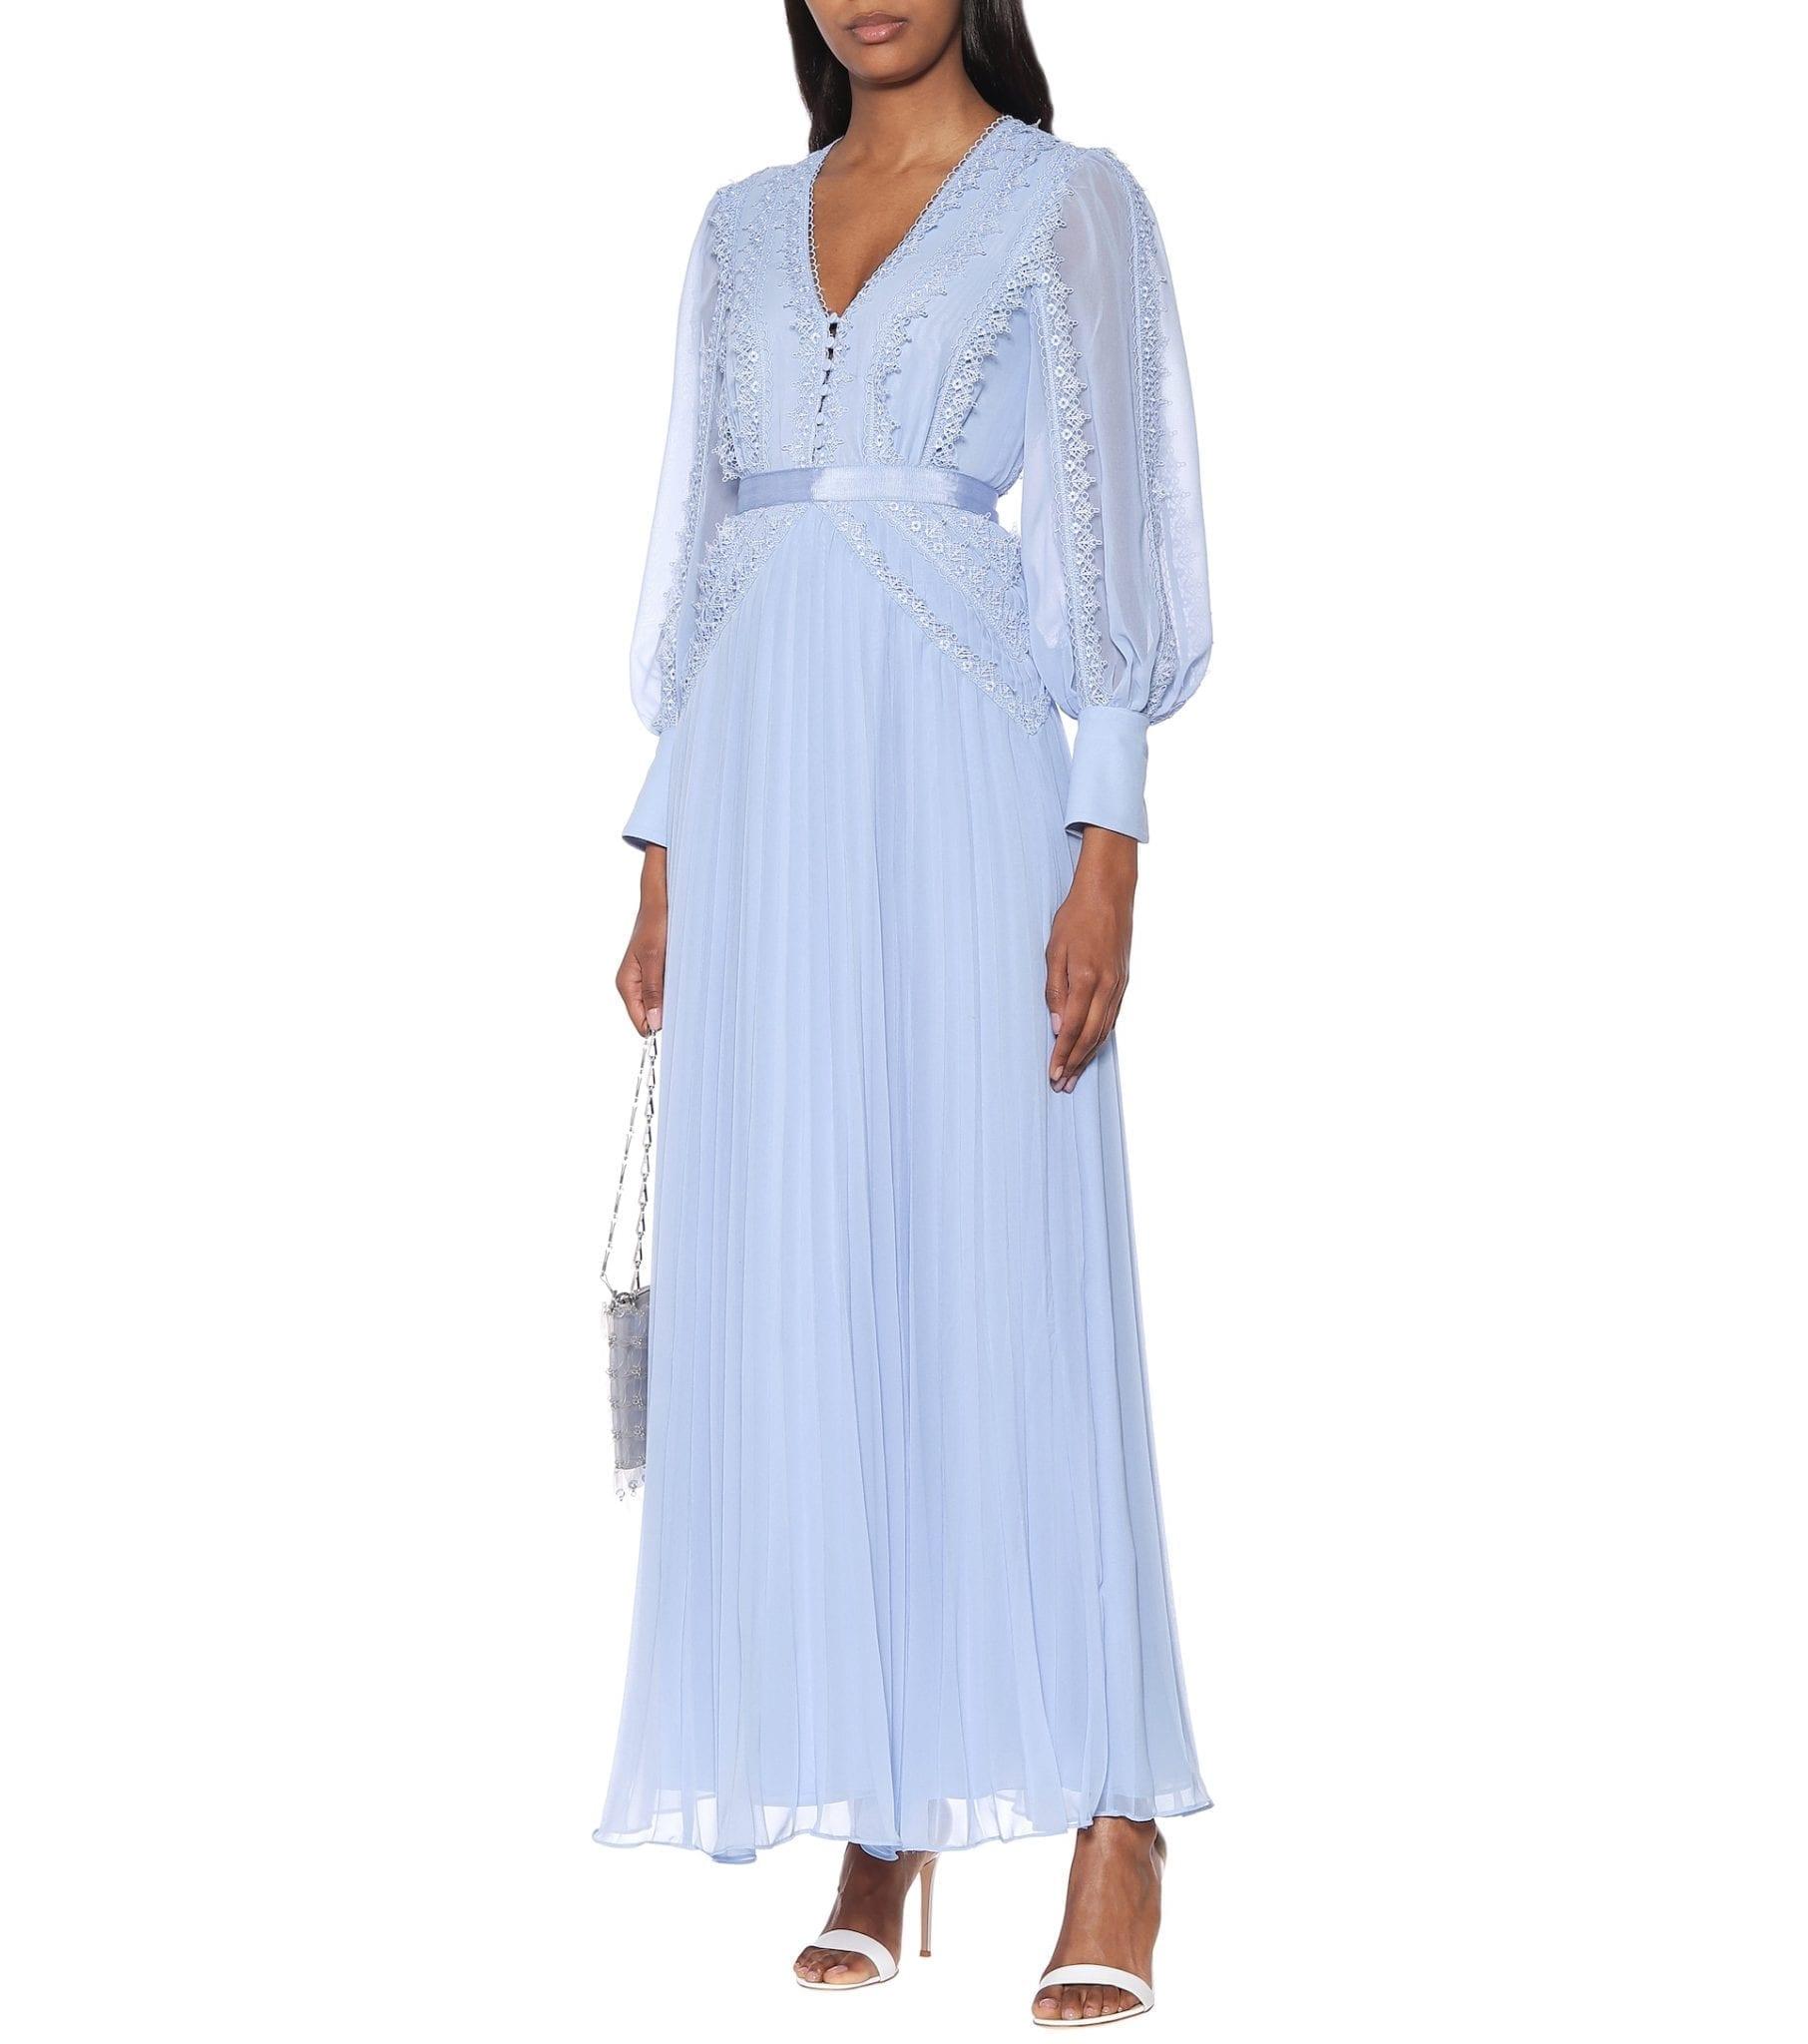 SELF-PORTRAIT Chiffon Maxi Dress